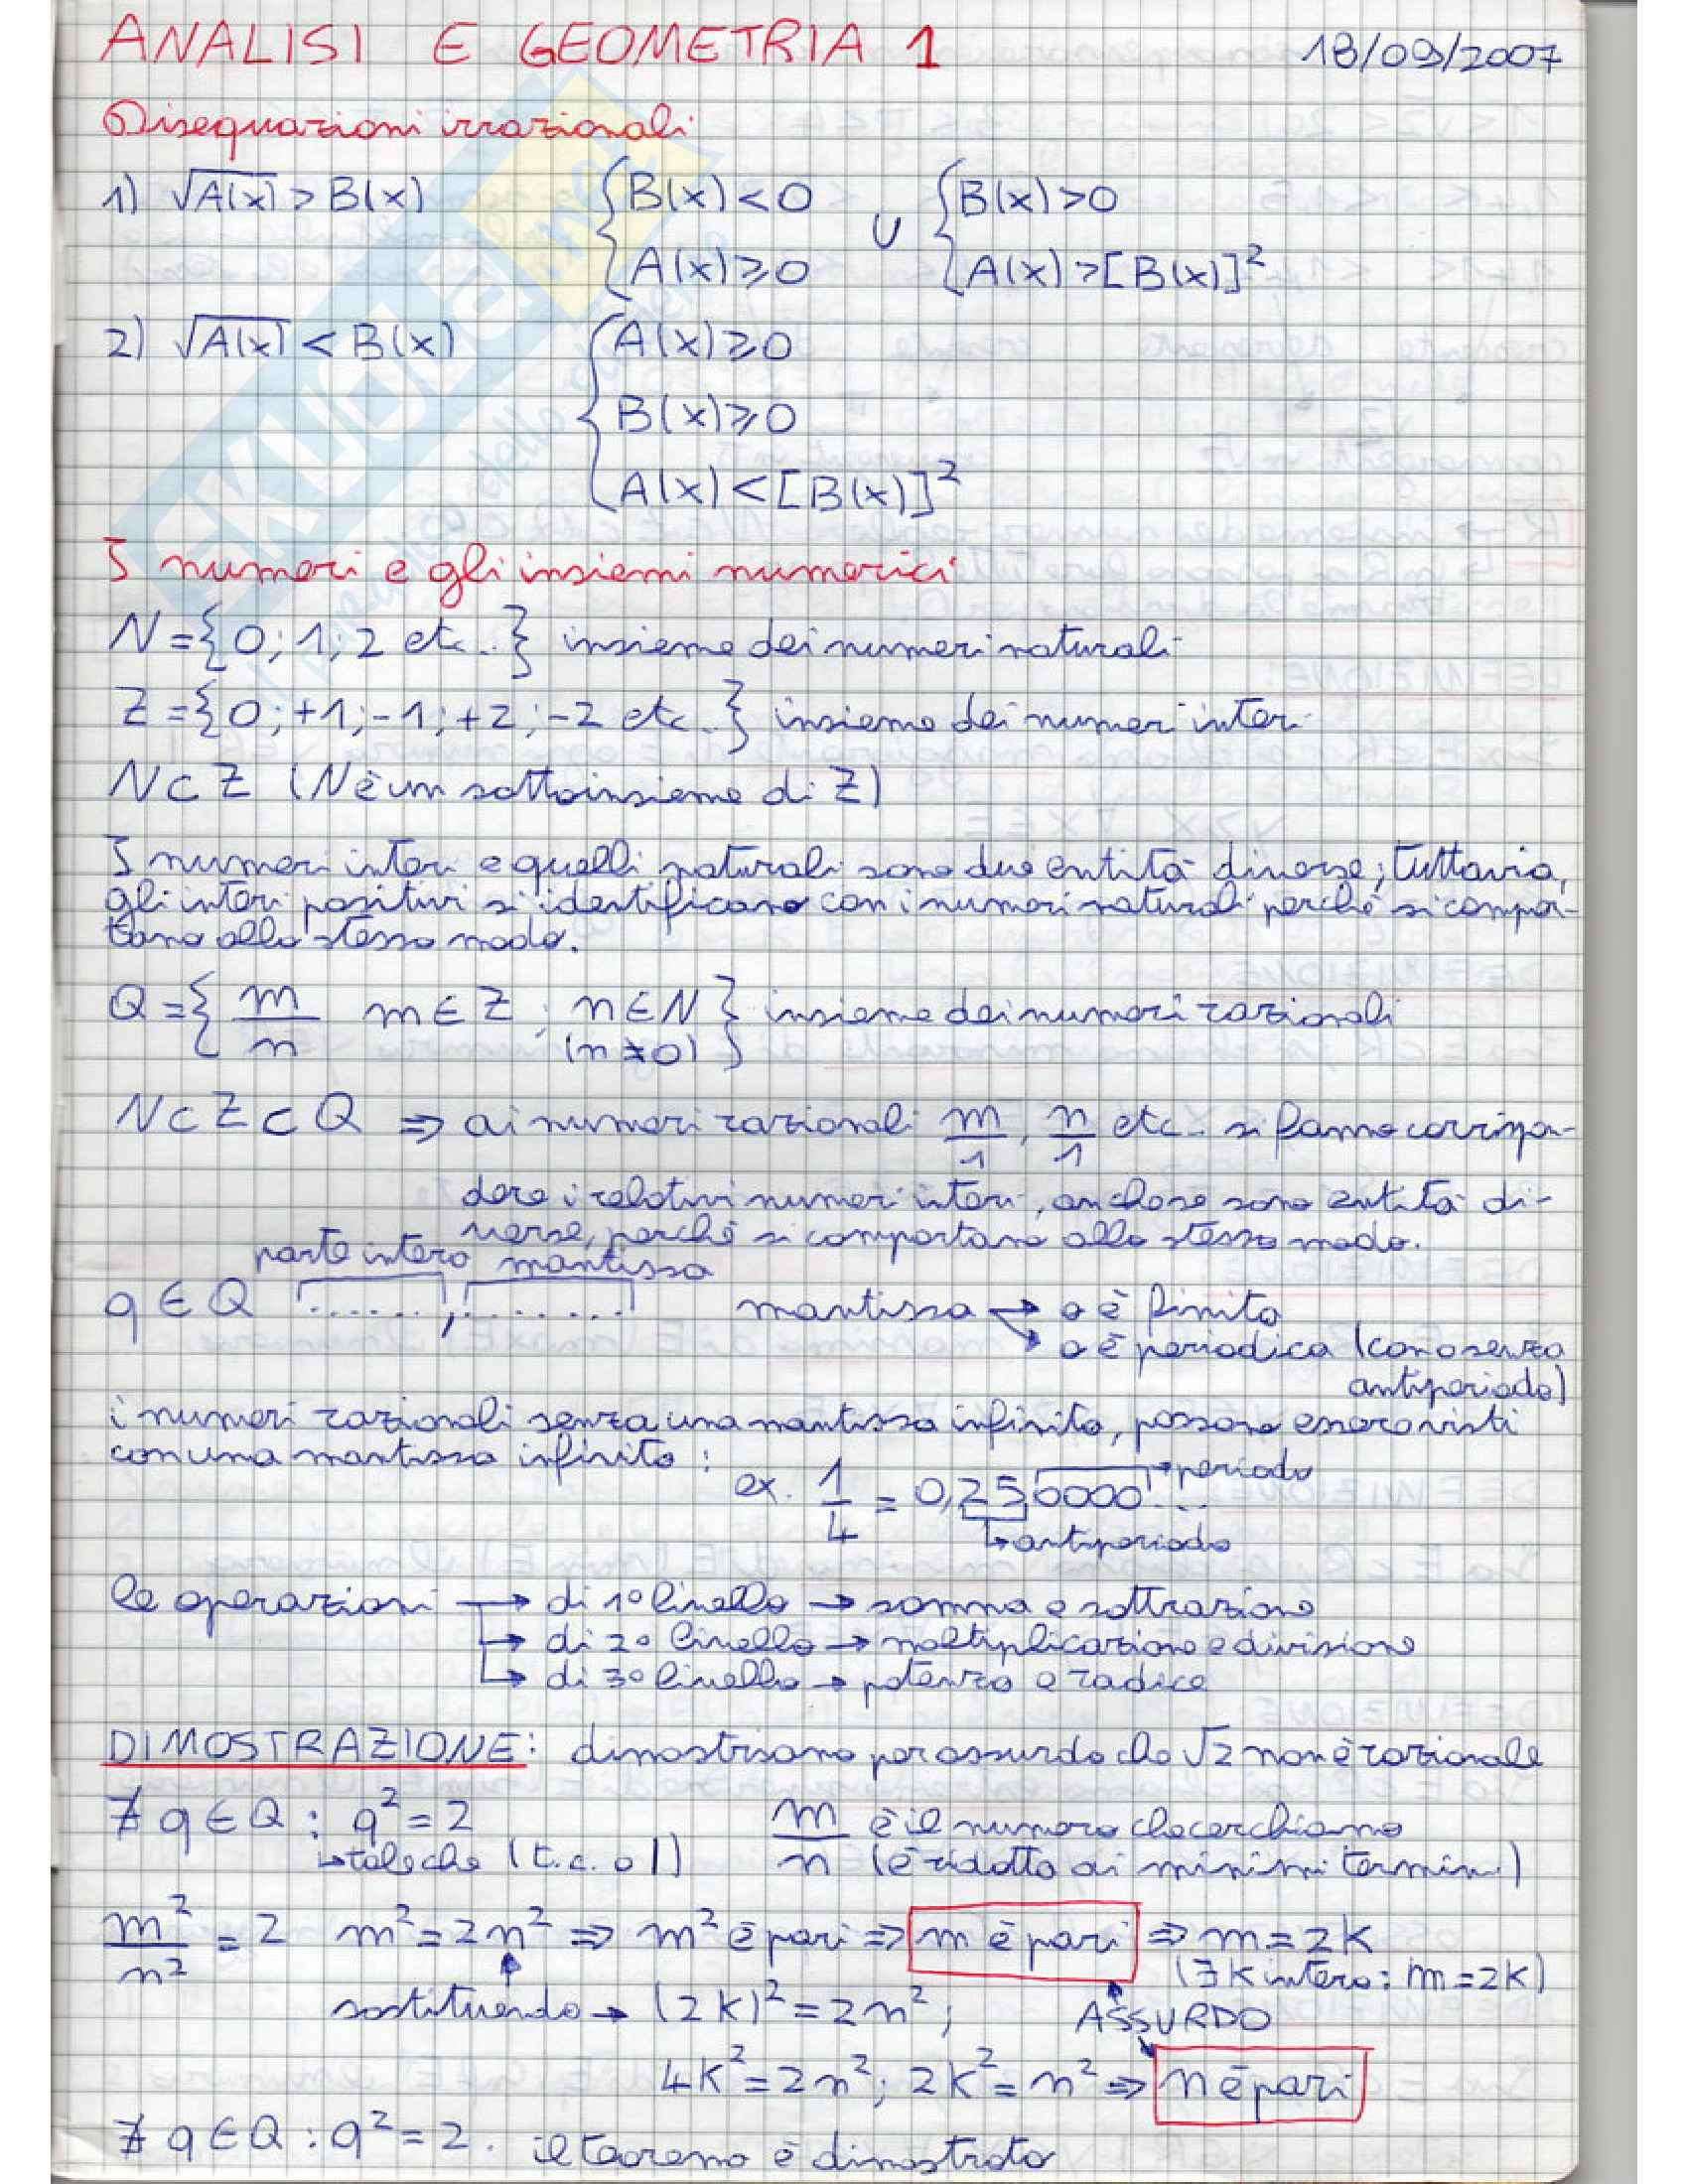 Analisi e geometria 1 - appunti Pag. 1